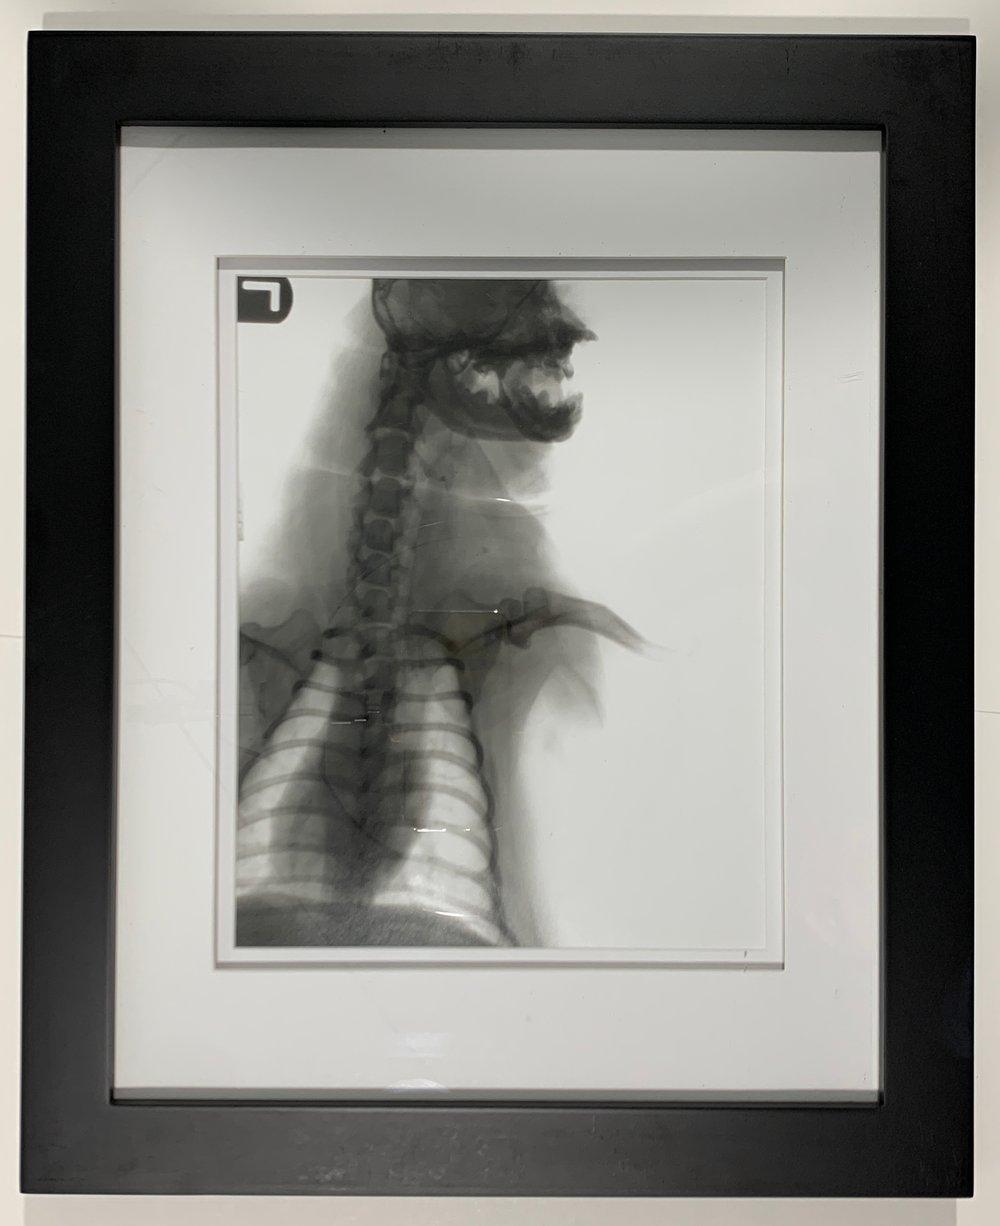 X-RAY PUG PORTRAIT - FRAMED